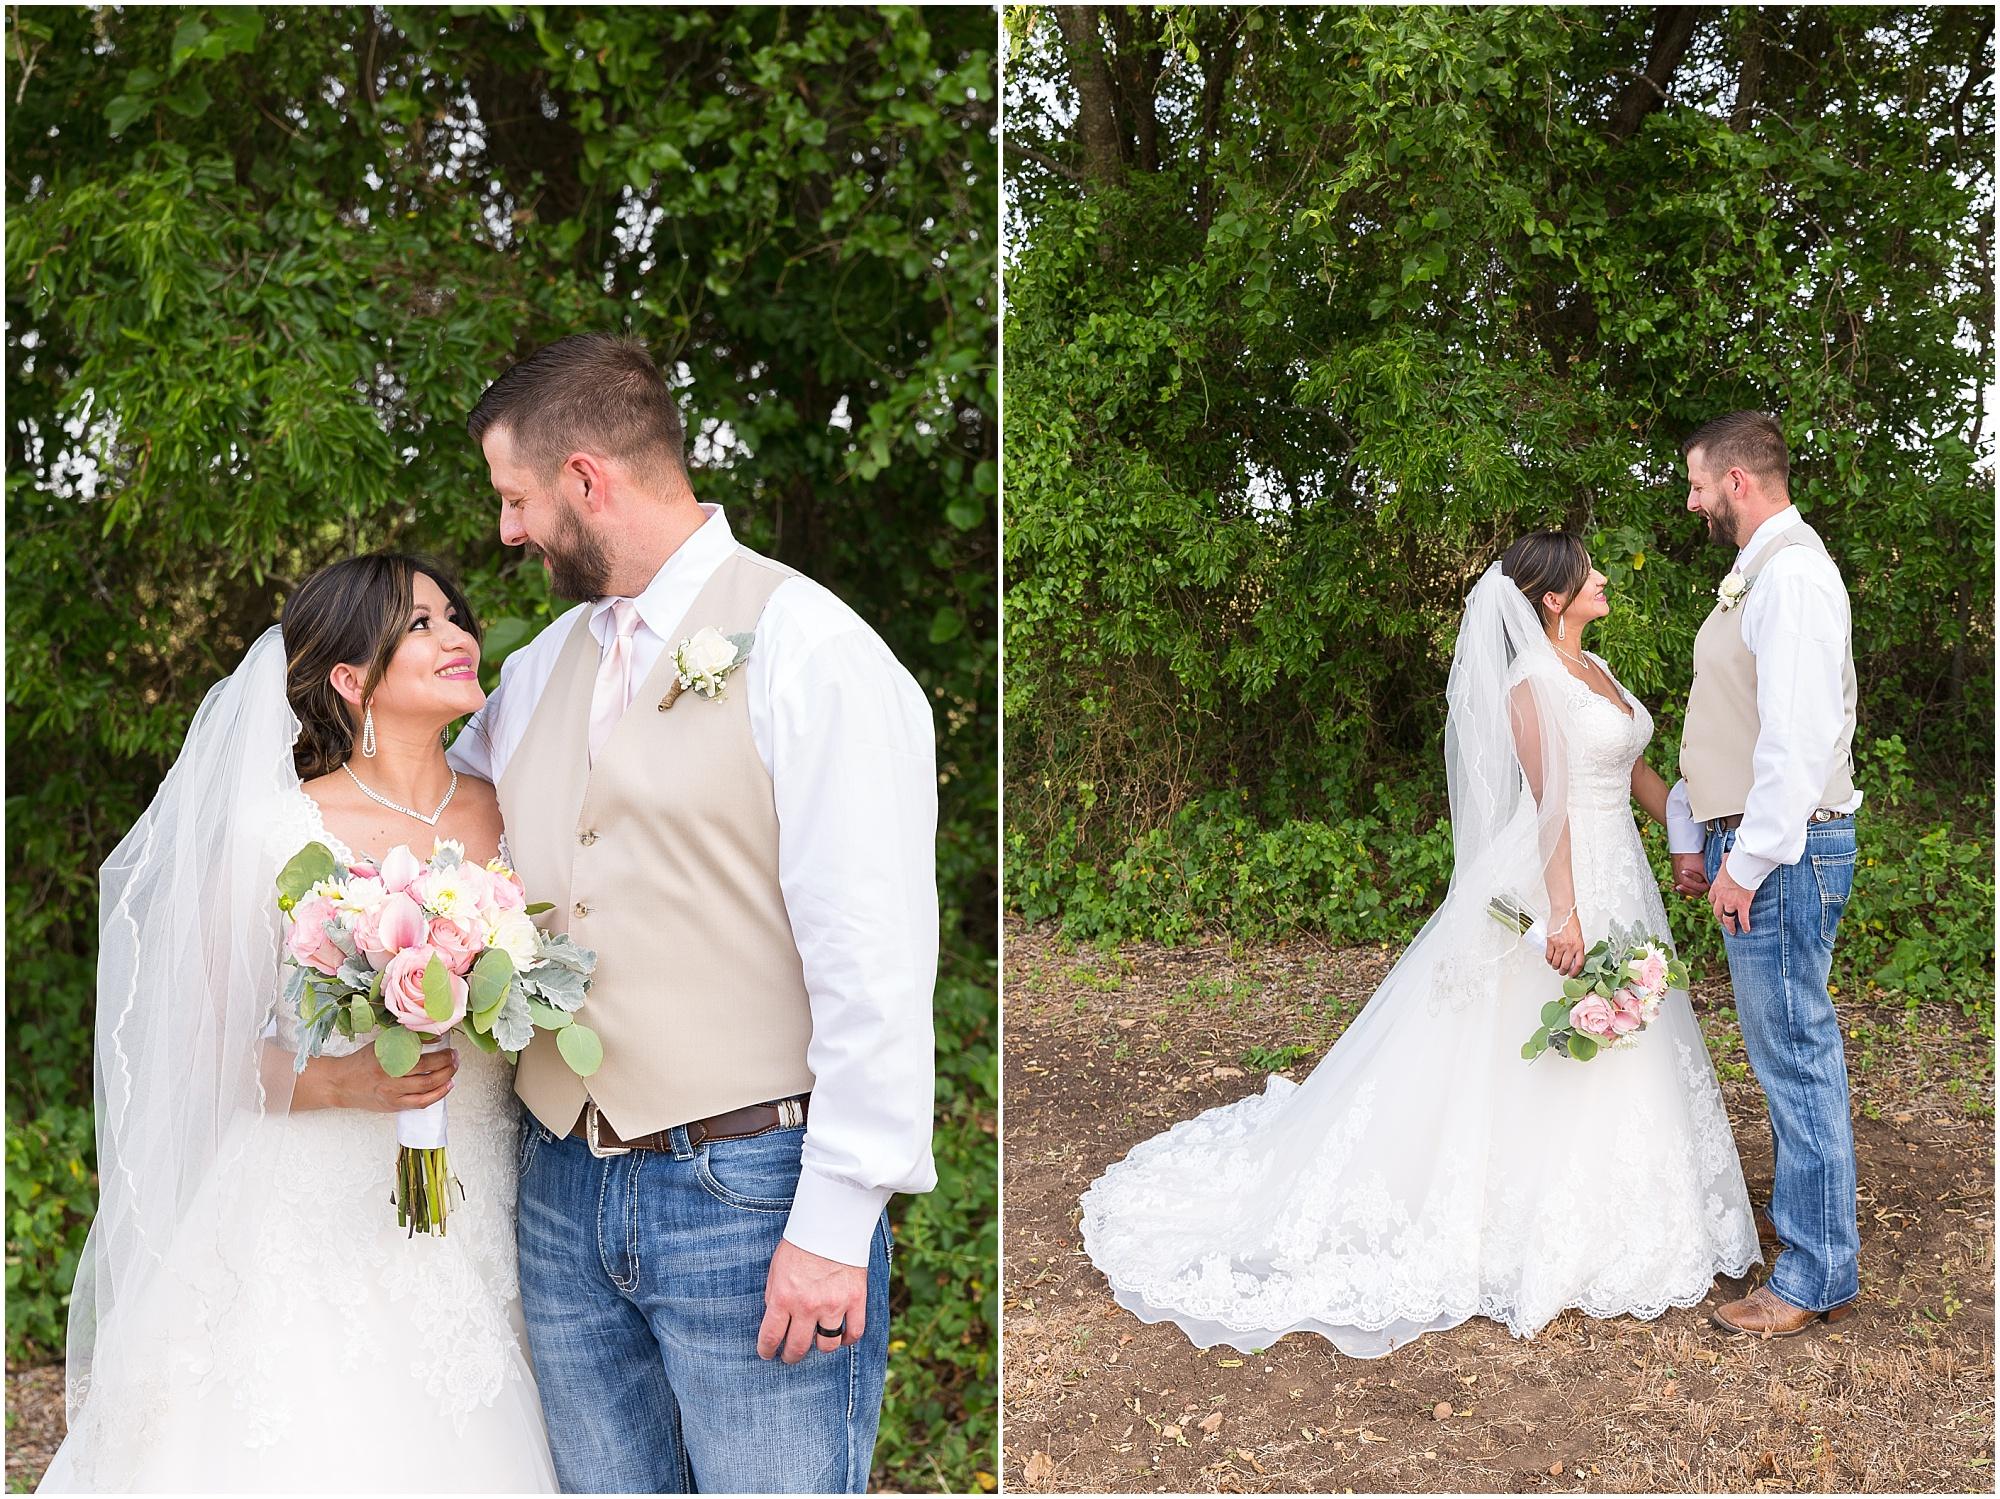 A bride and groom smile at each other after their wedding ceremony - Jason & Melaina Photography - www.jasonandmelaina.com